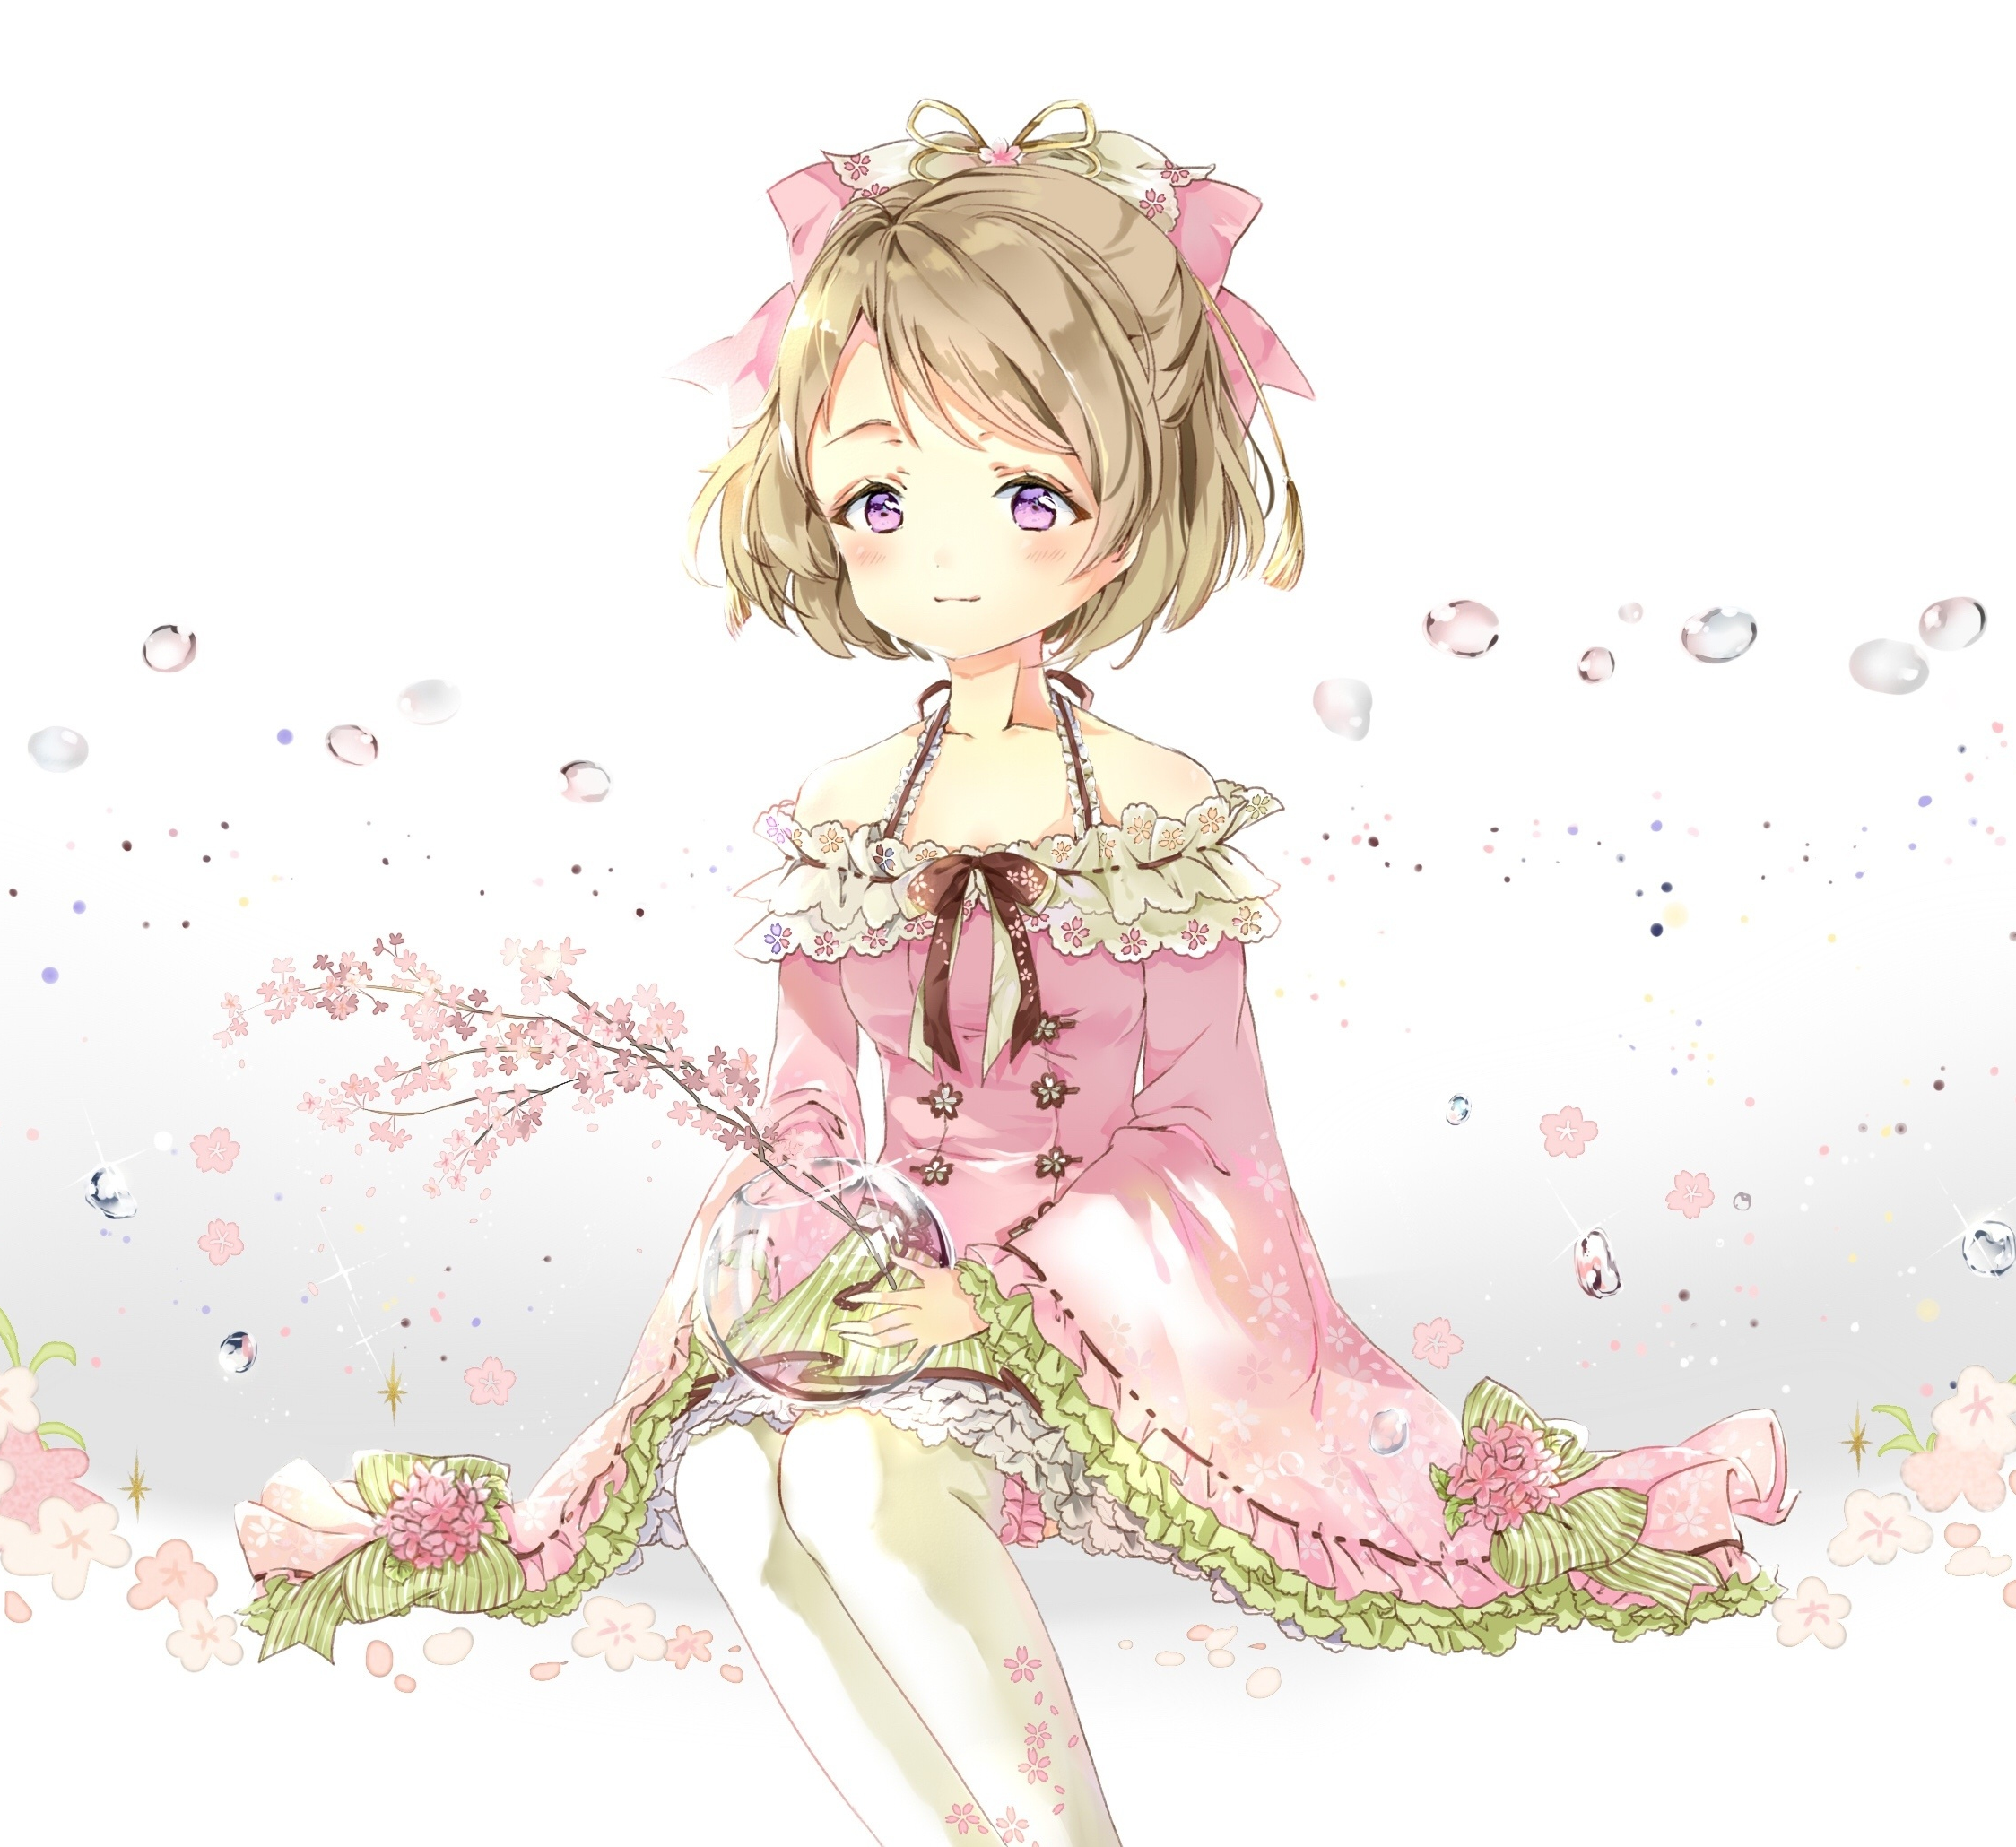 Cute Minimal Hanayo Koizumi Love Live Anime Girl 2248x2248 Wallpaper